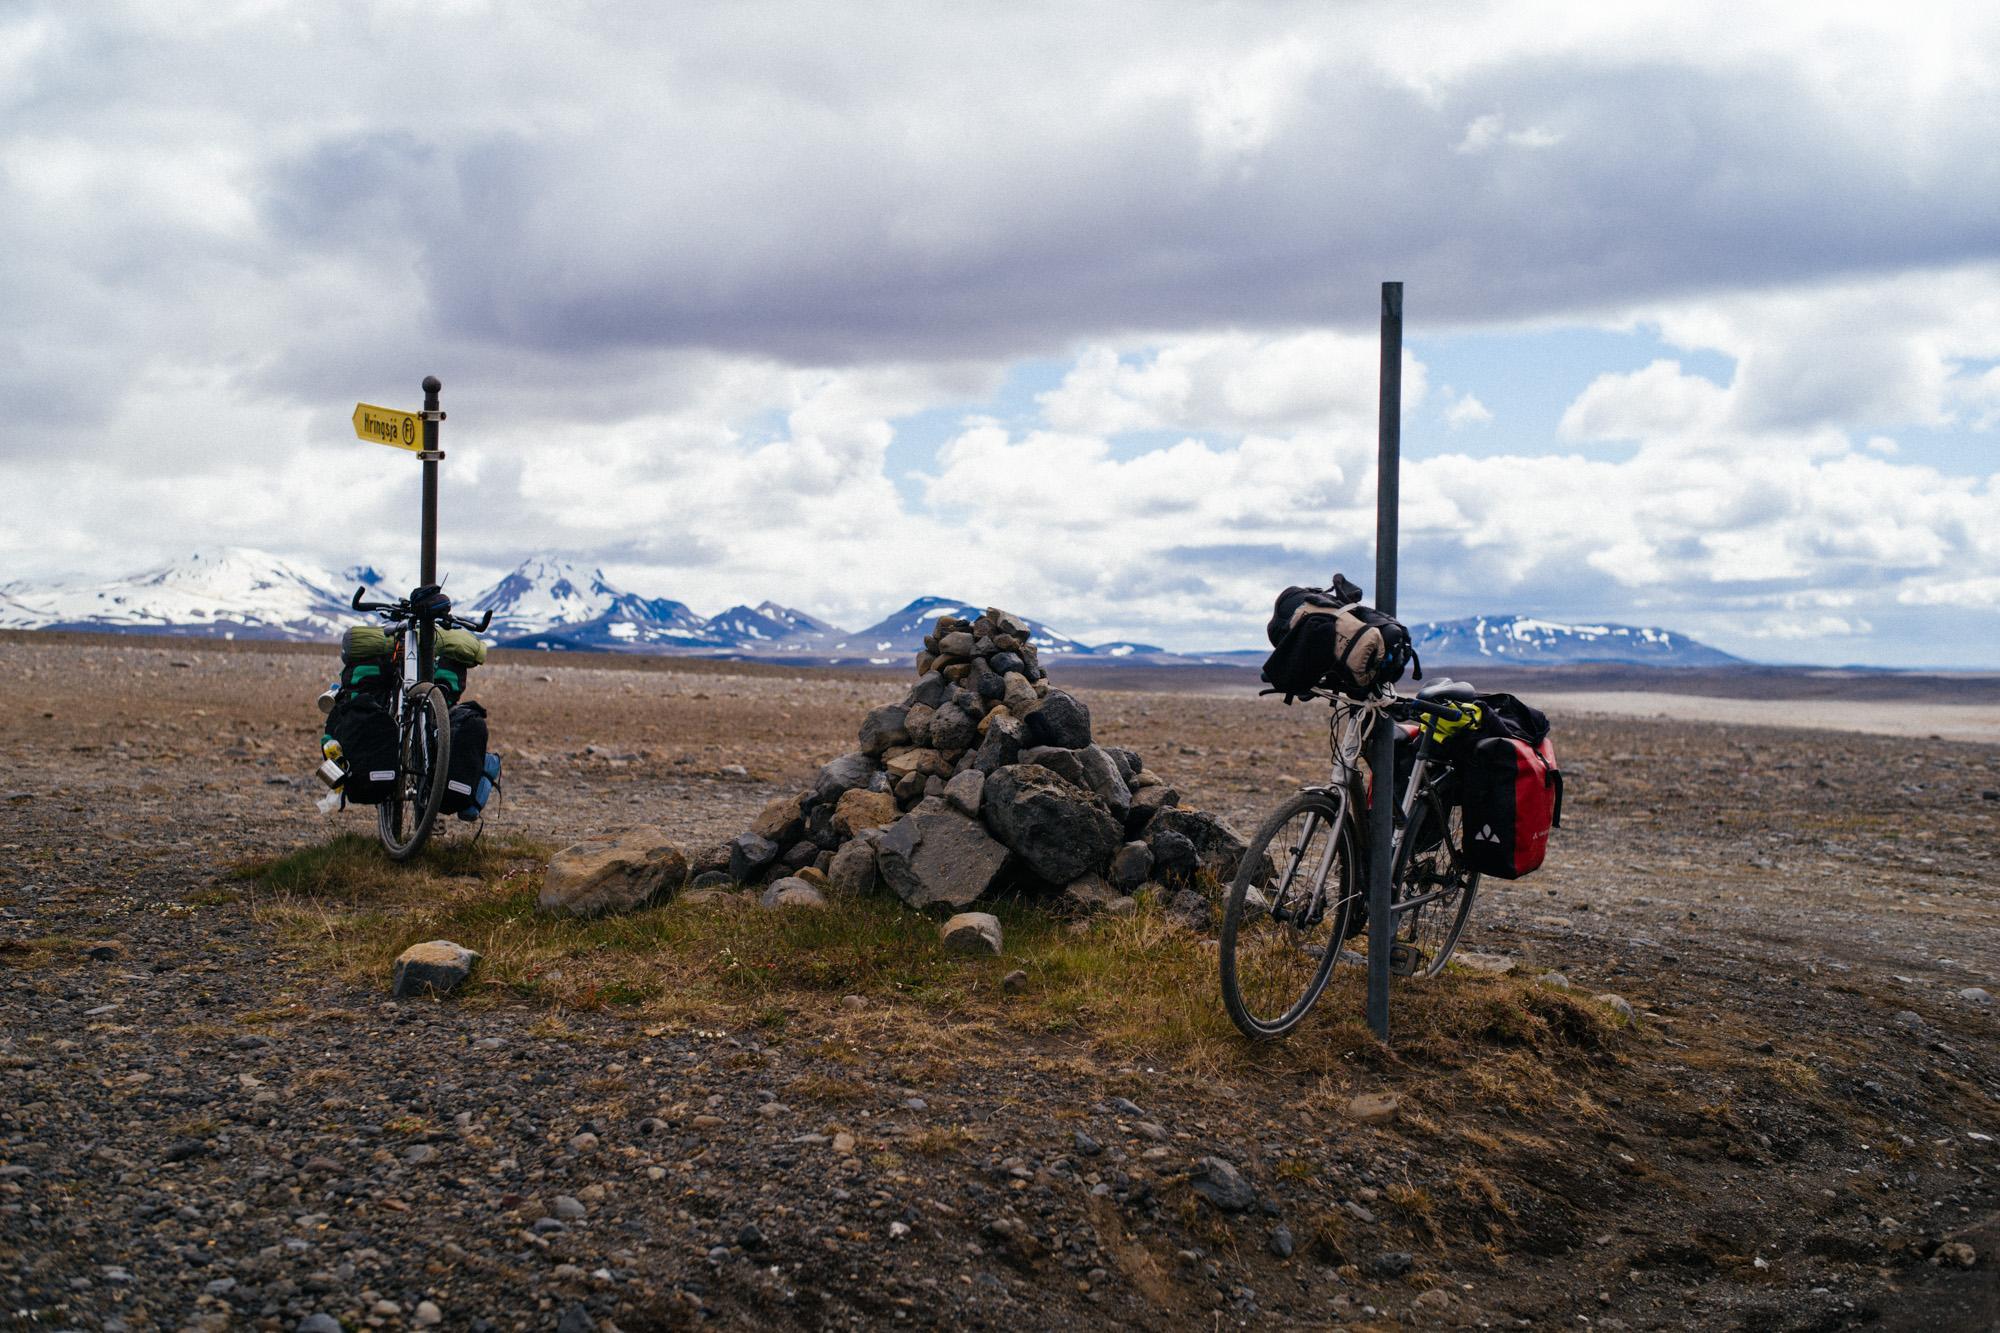 Cyclotourists